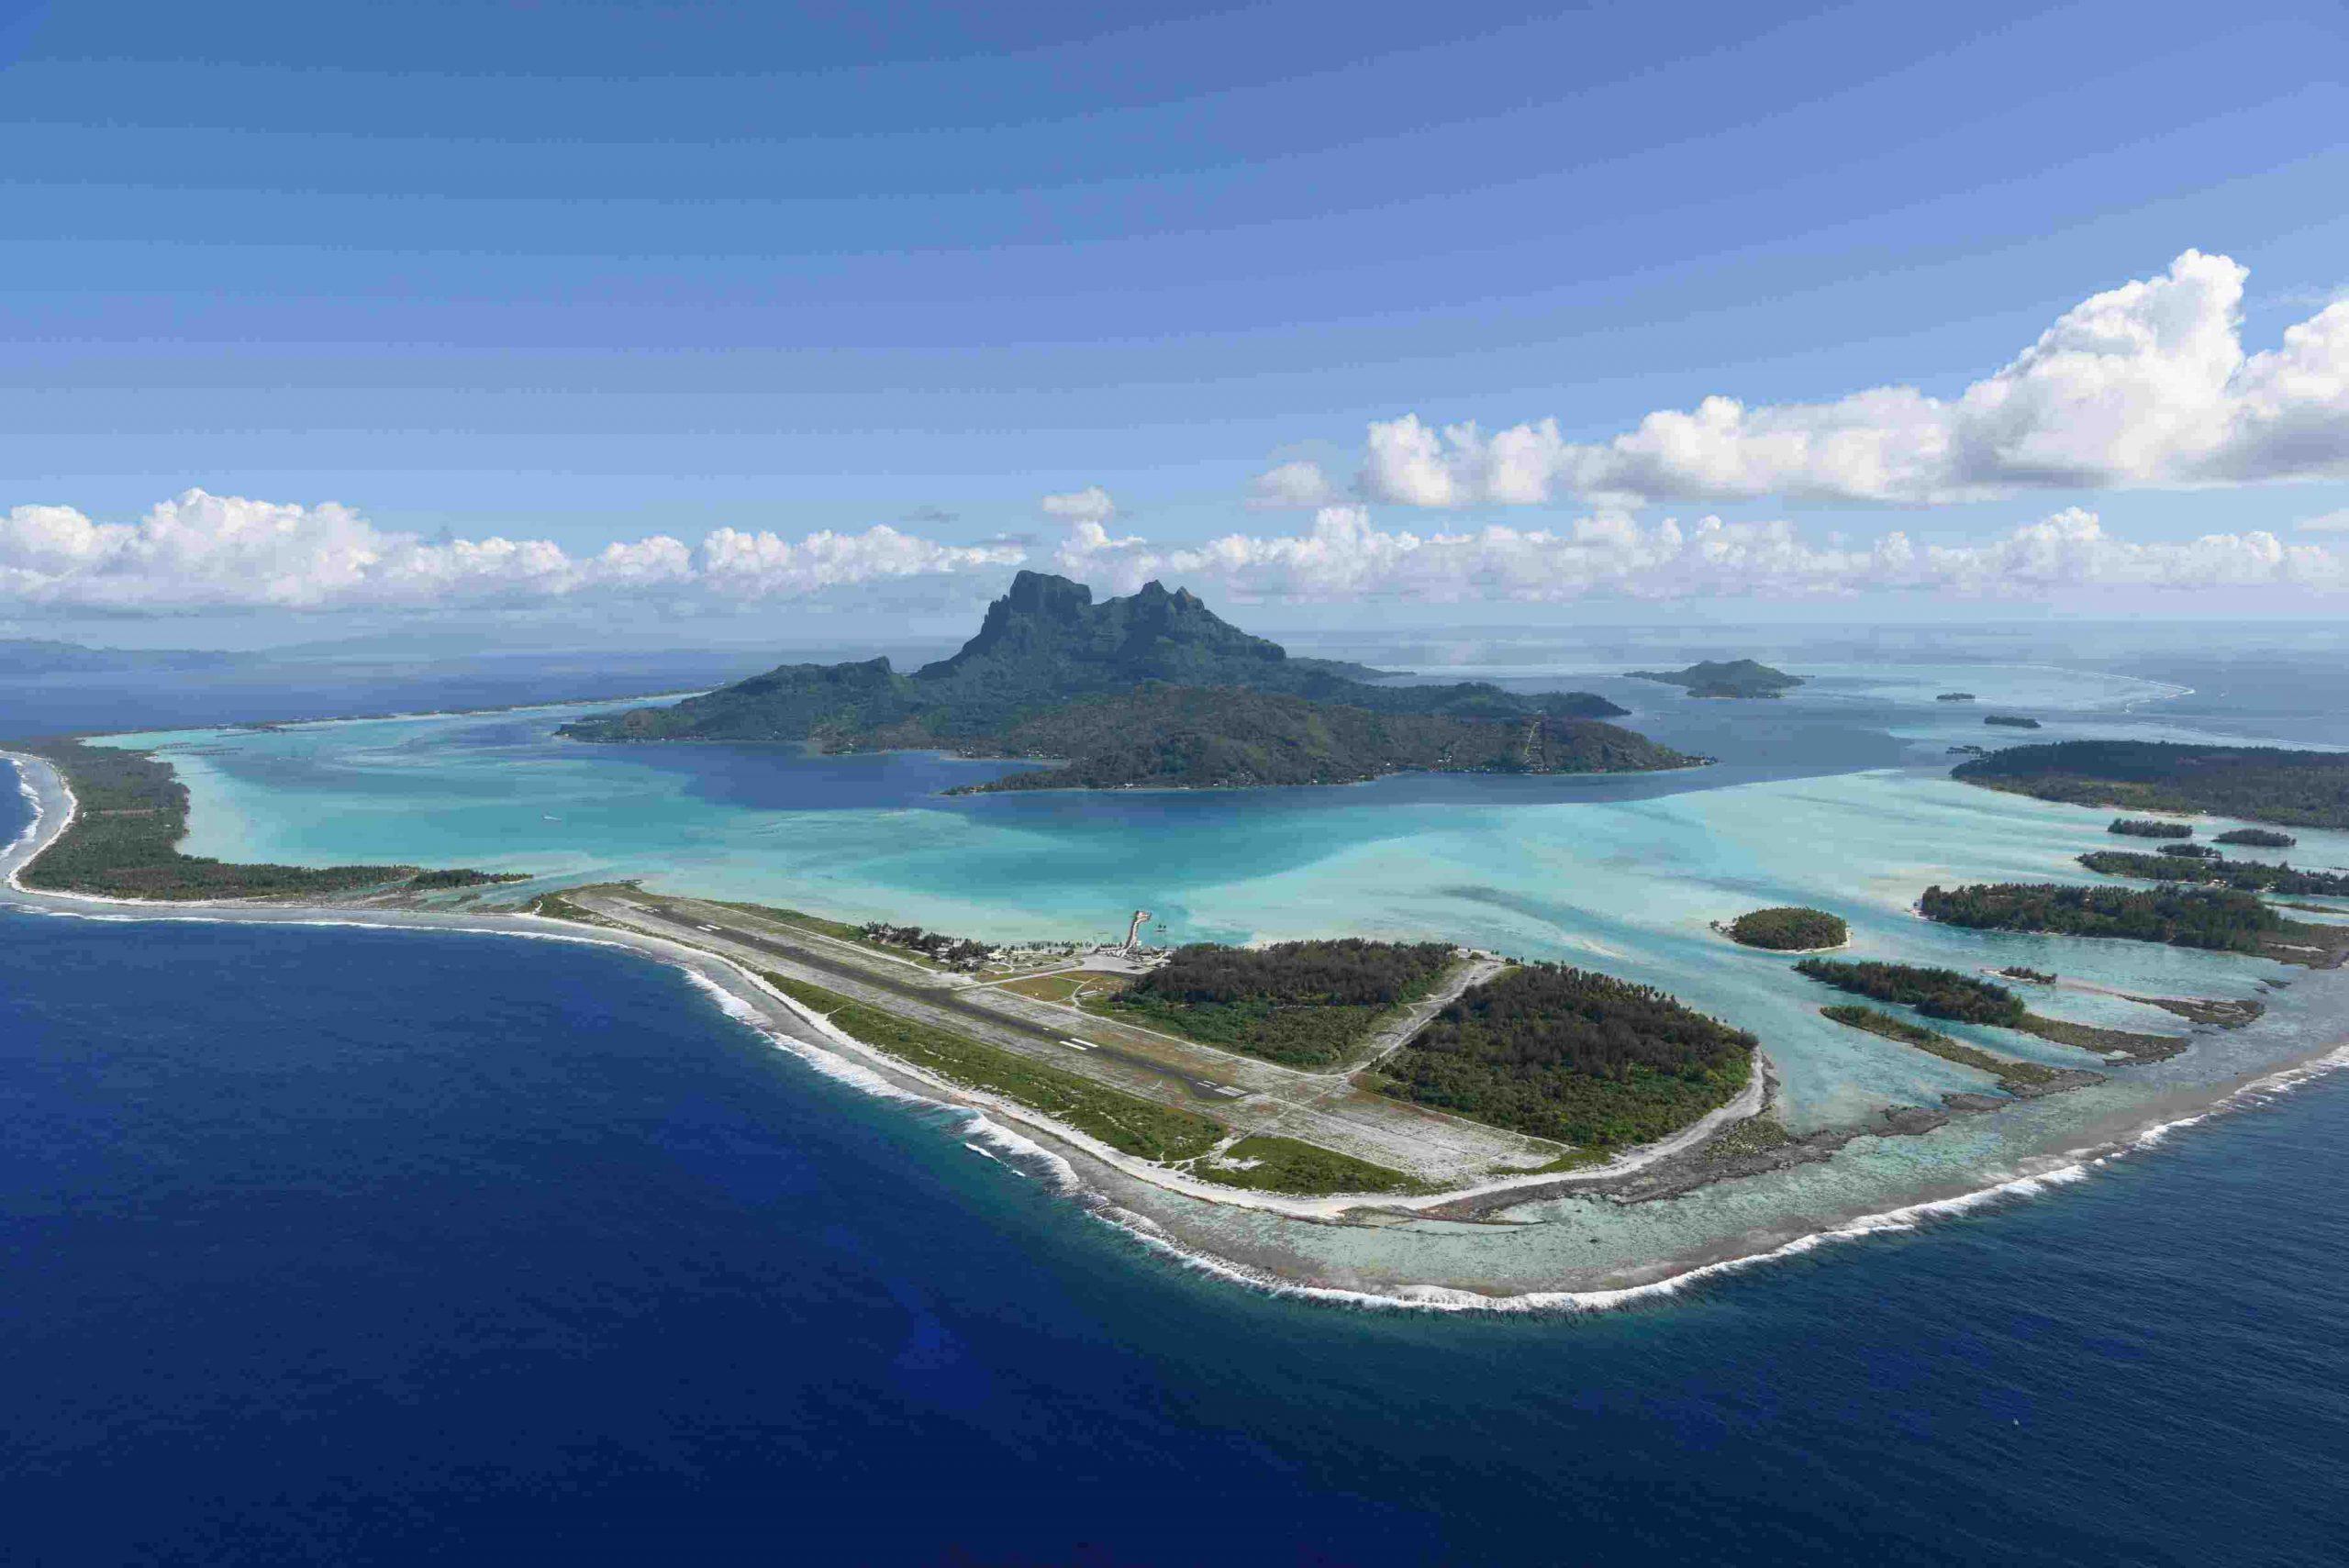 What is the main language in Bora Bora?